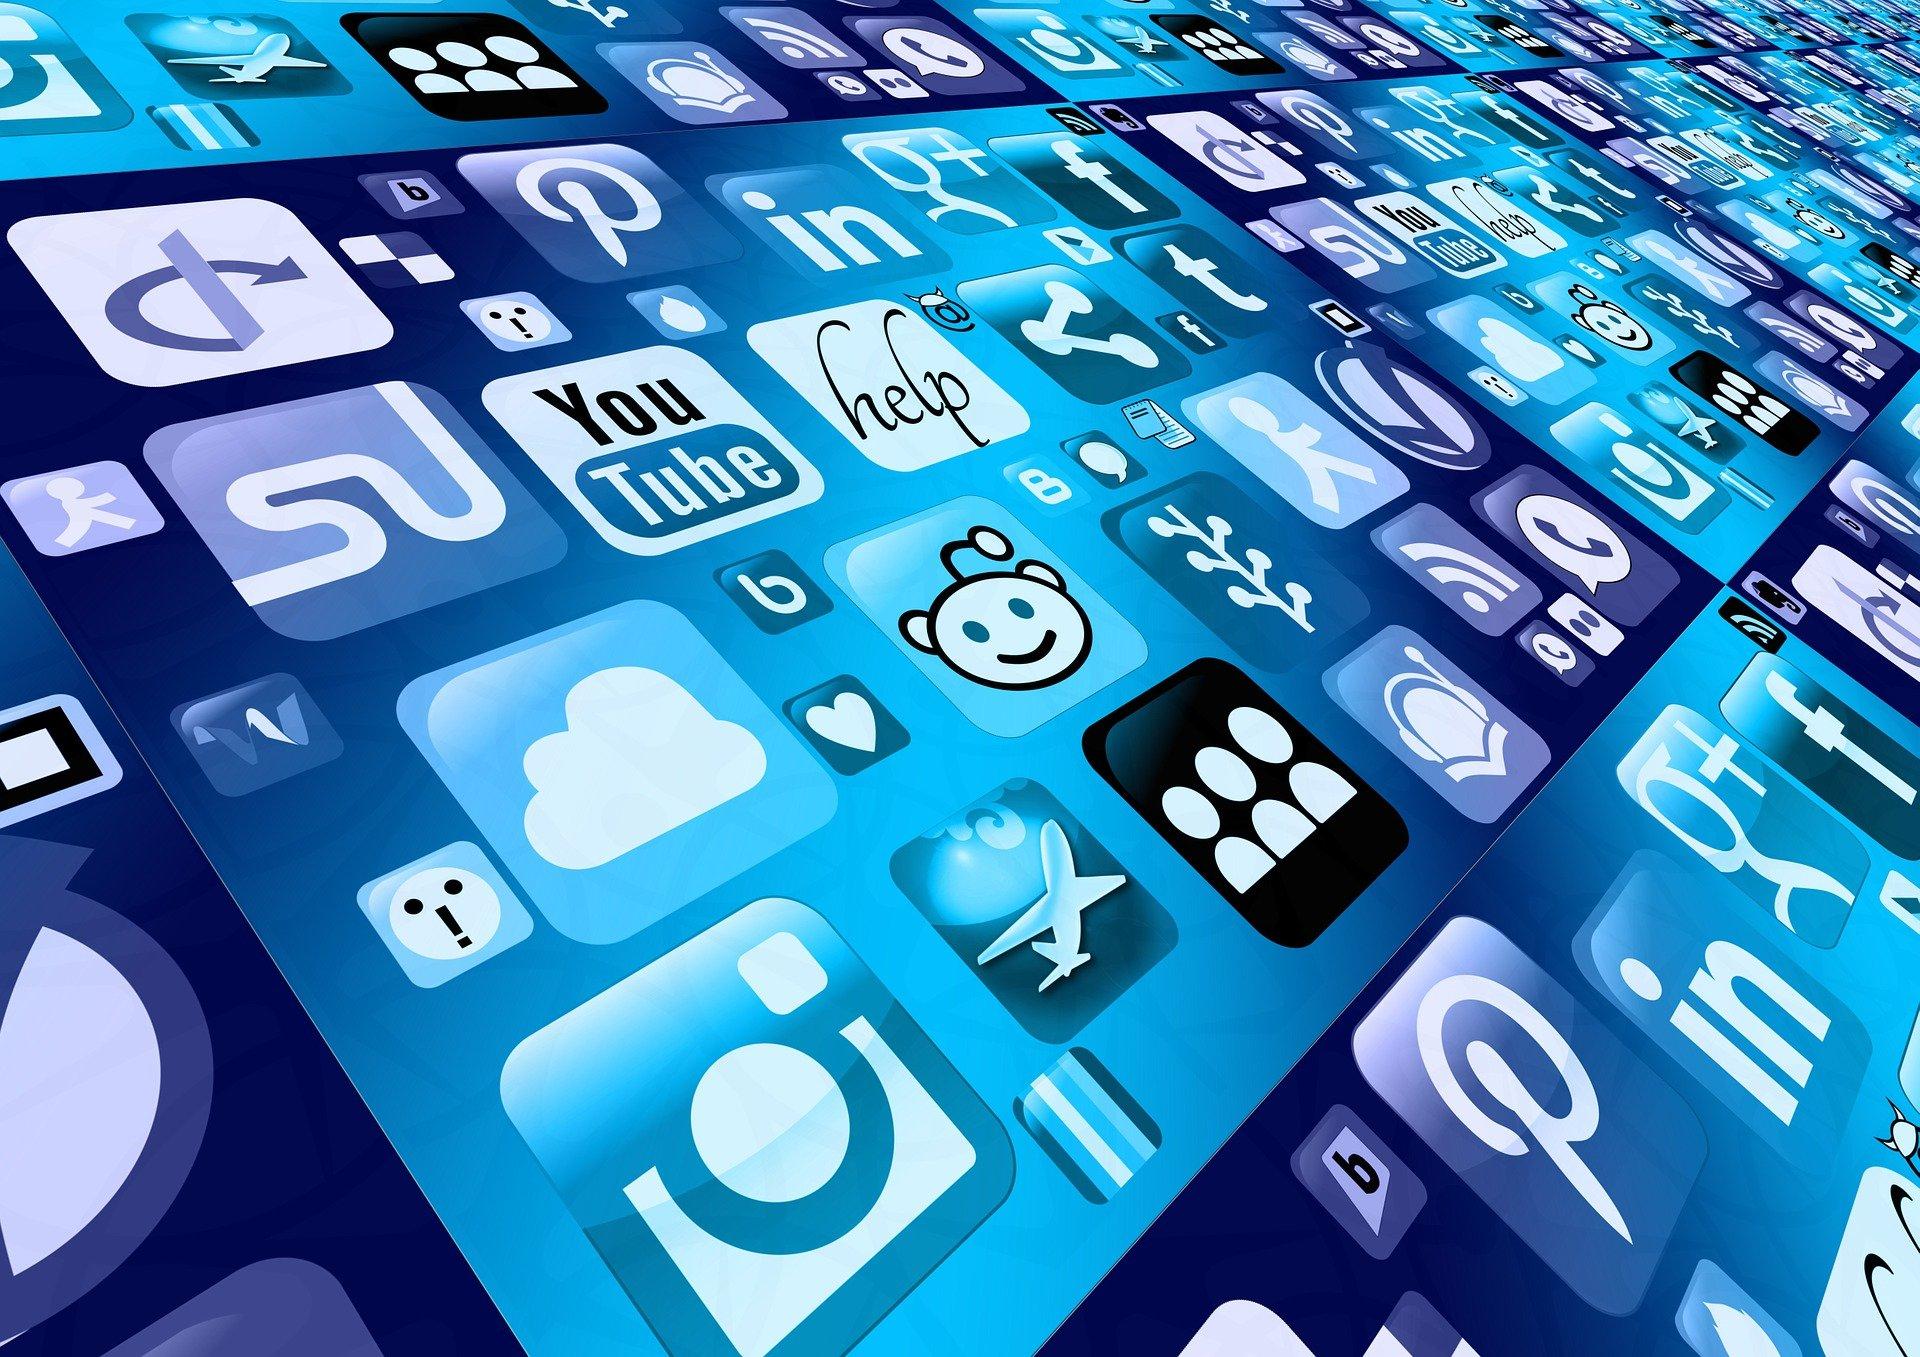 BusHuddle Podcast: Build trust with social media